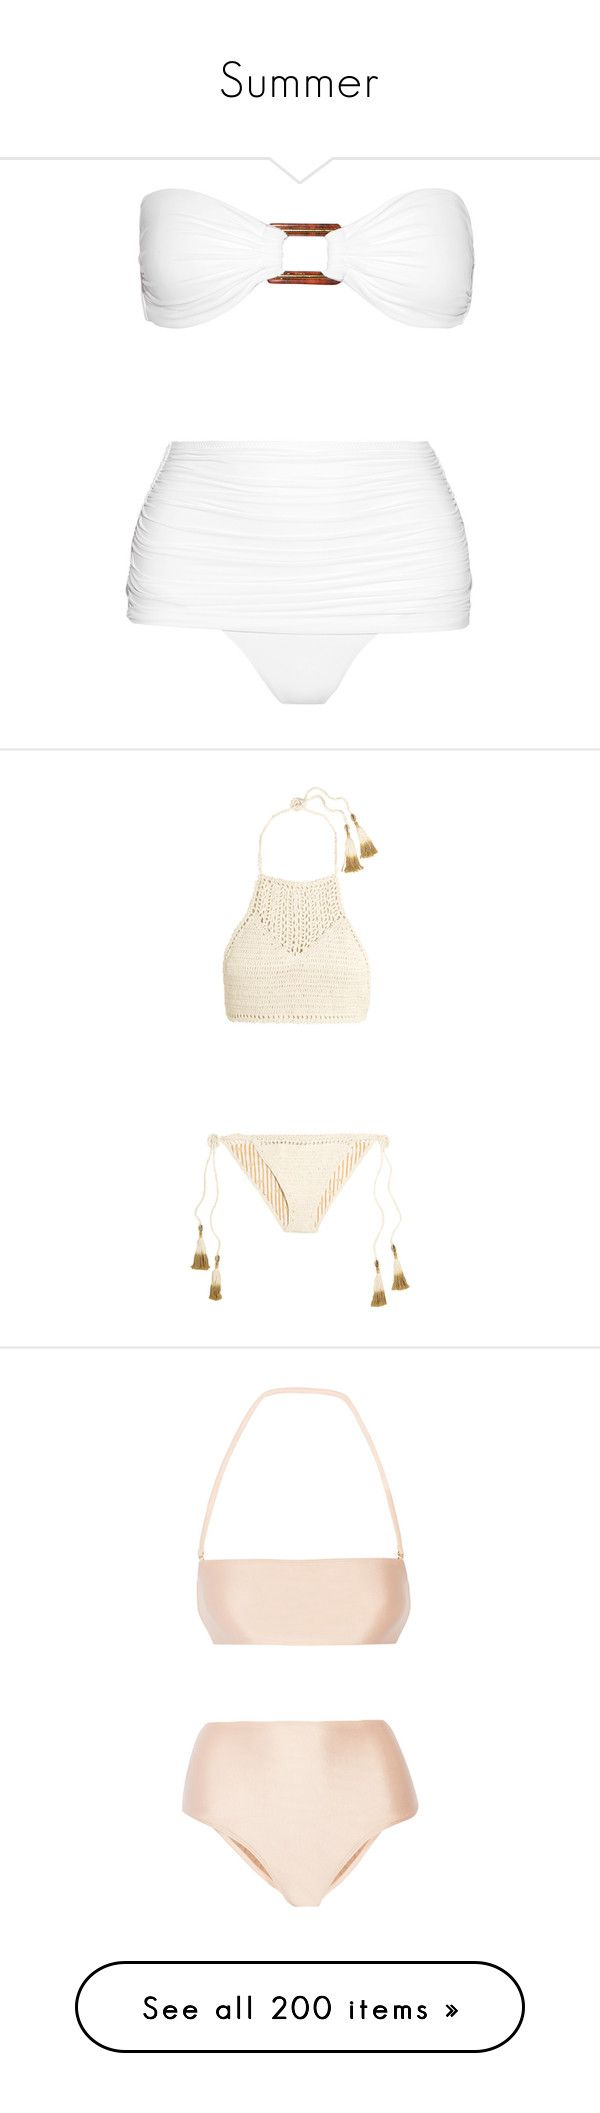 """Summer"" by pinkypanky ❤ liked on Polyvore featuring white, tie bikini, white bikini, bandeau top, scrunch bikini, ruched high waisted bikini, swimwear, bikinis, swimsuits and bikini"